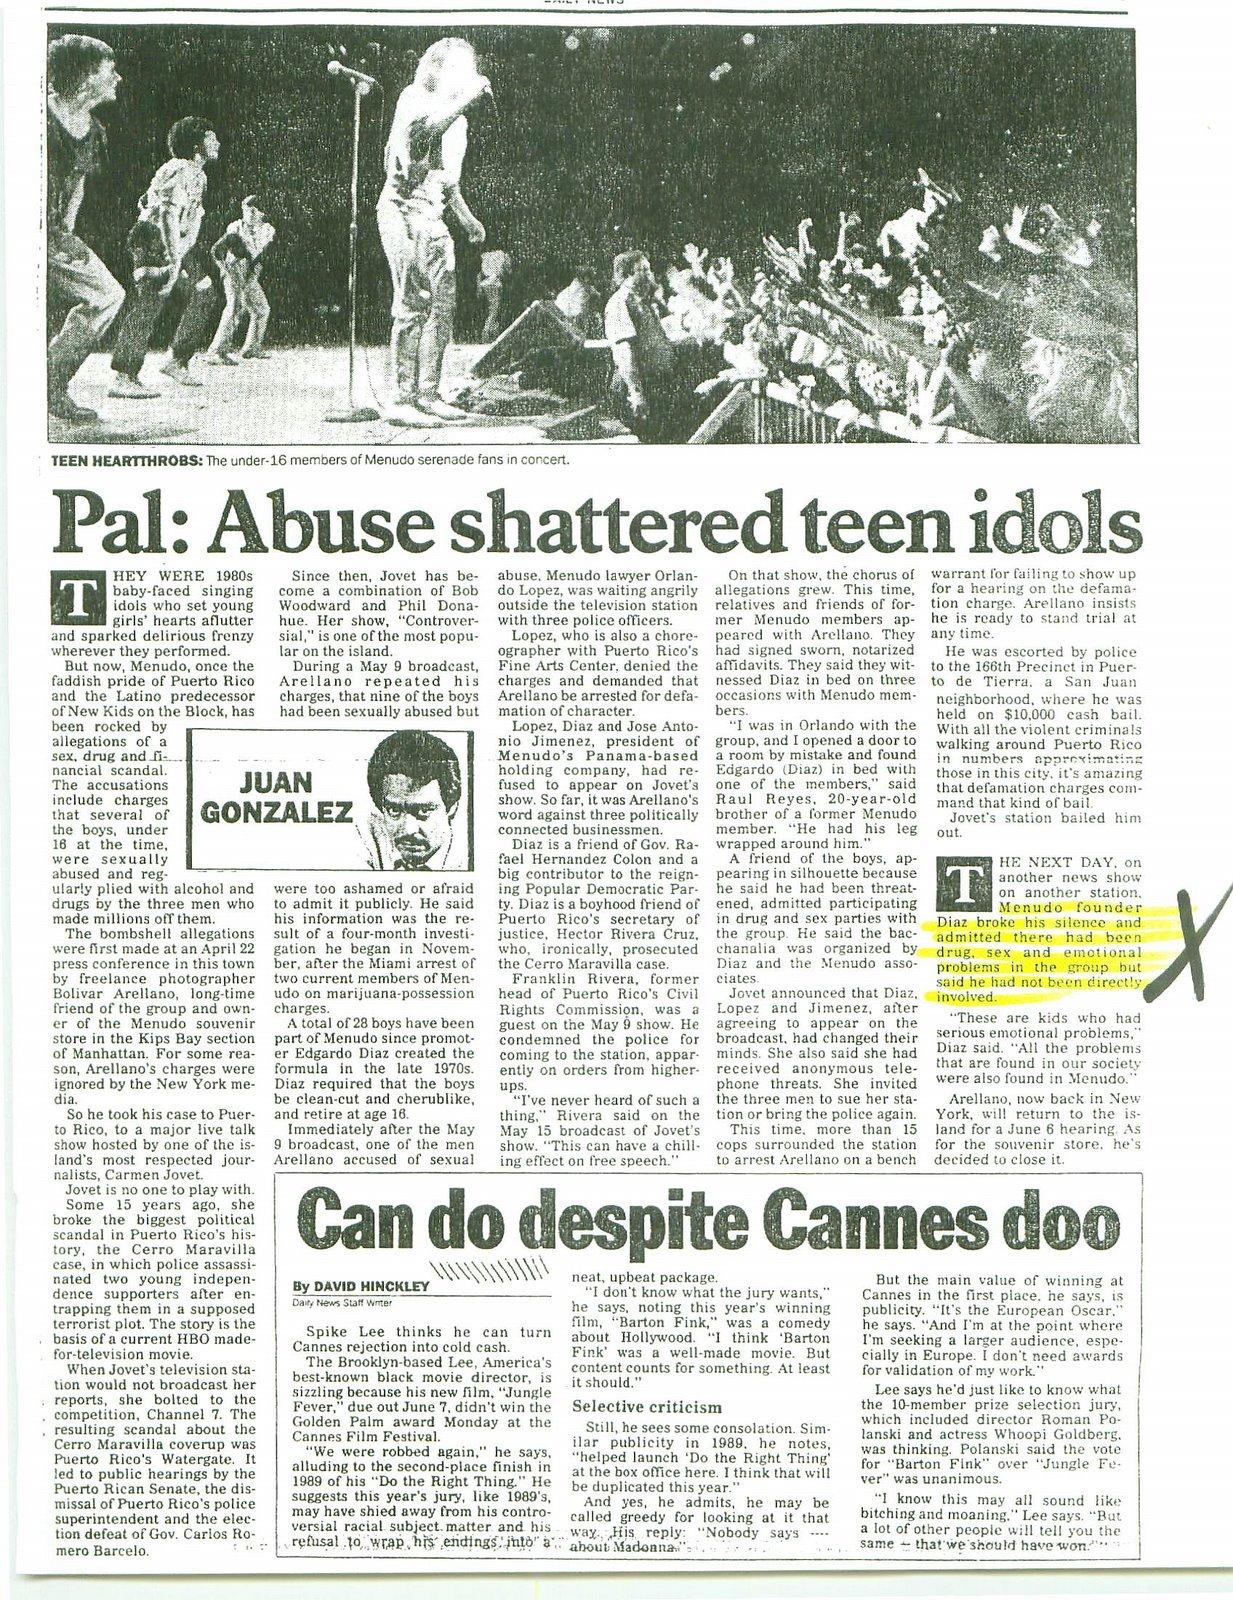 http://3.bp.blogspot.com/_-4lHrY4ijyI/S7Lw8sksu6I/AAAAAAAAApw/z_88ph6Rakg/s1600/Daily+News+Menudo+Scandal+91_Page_2.jpg